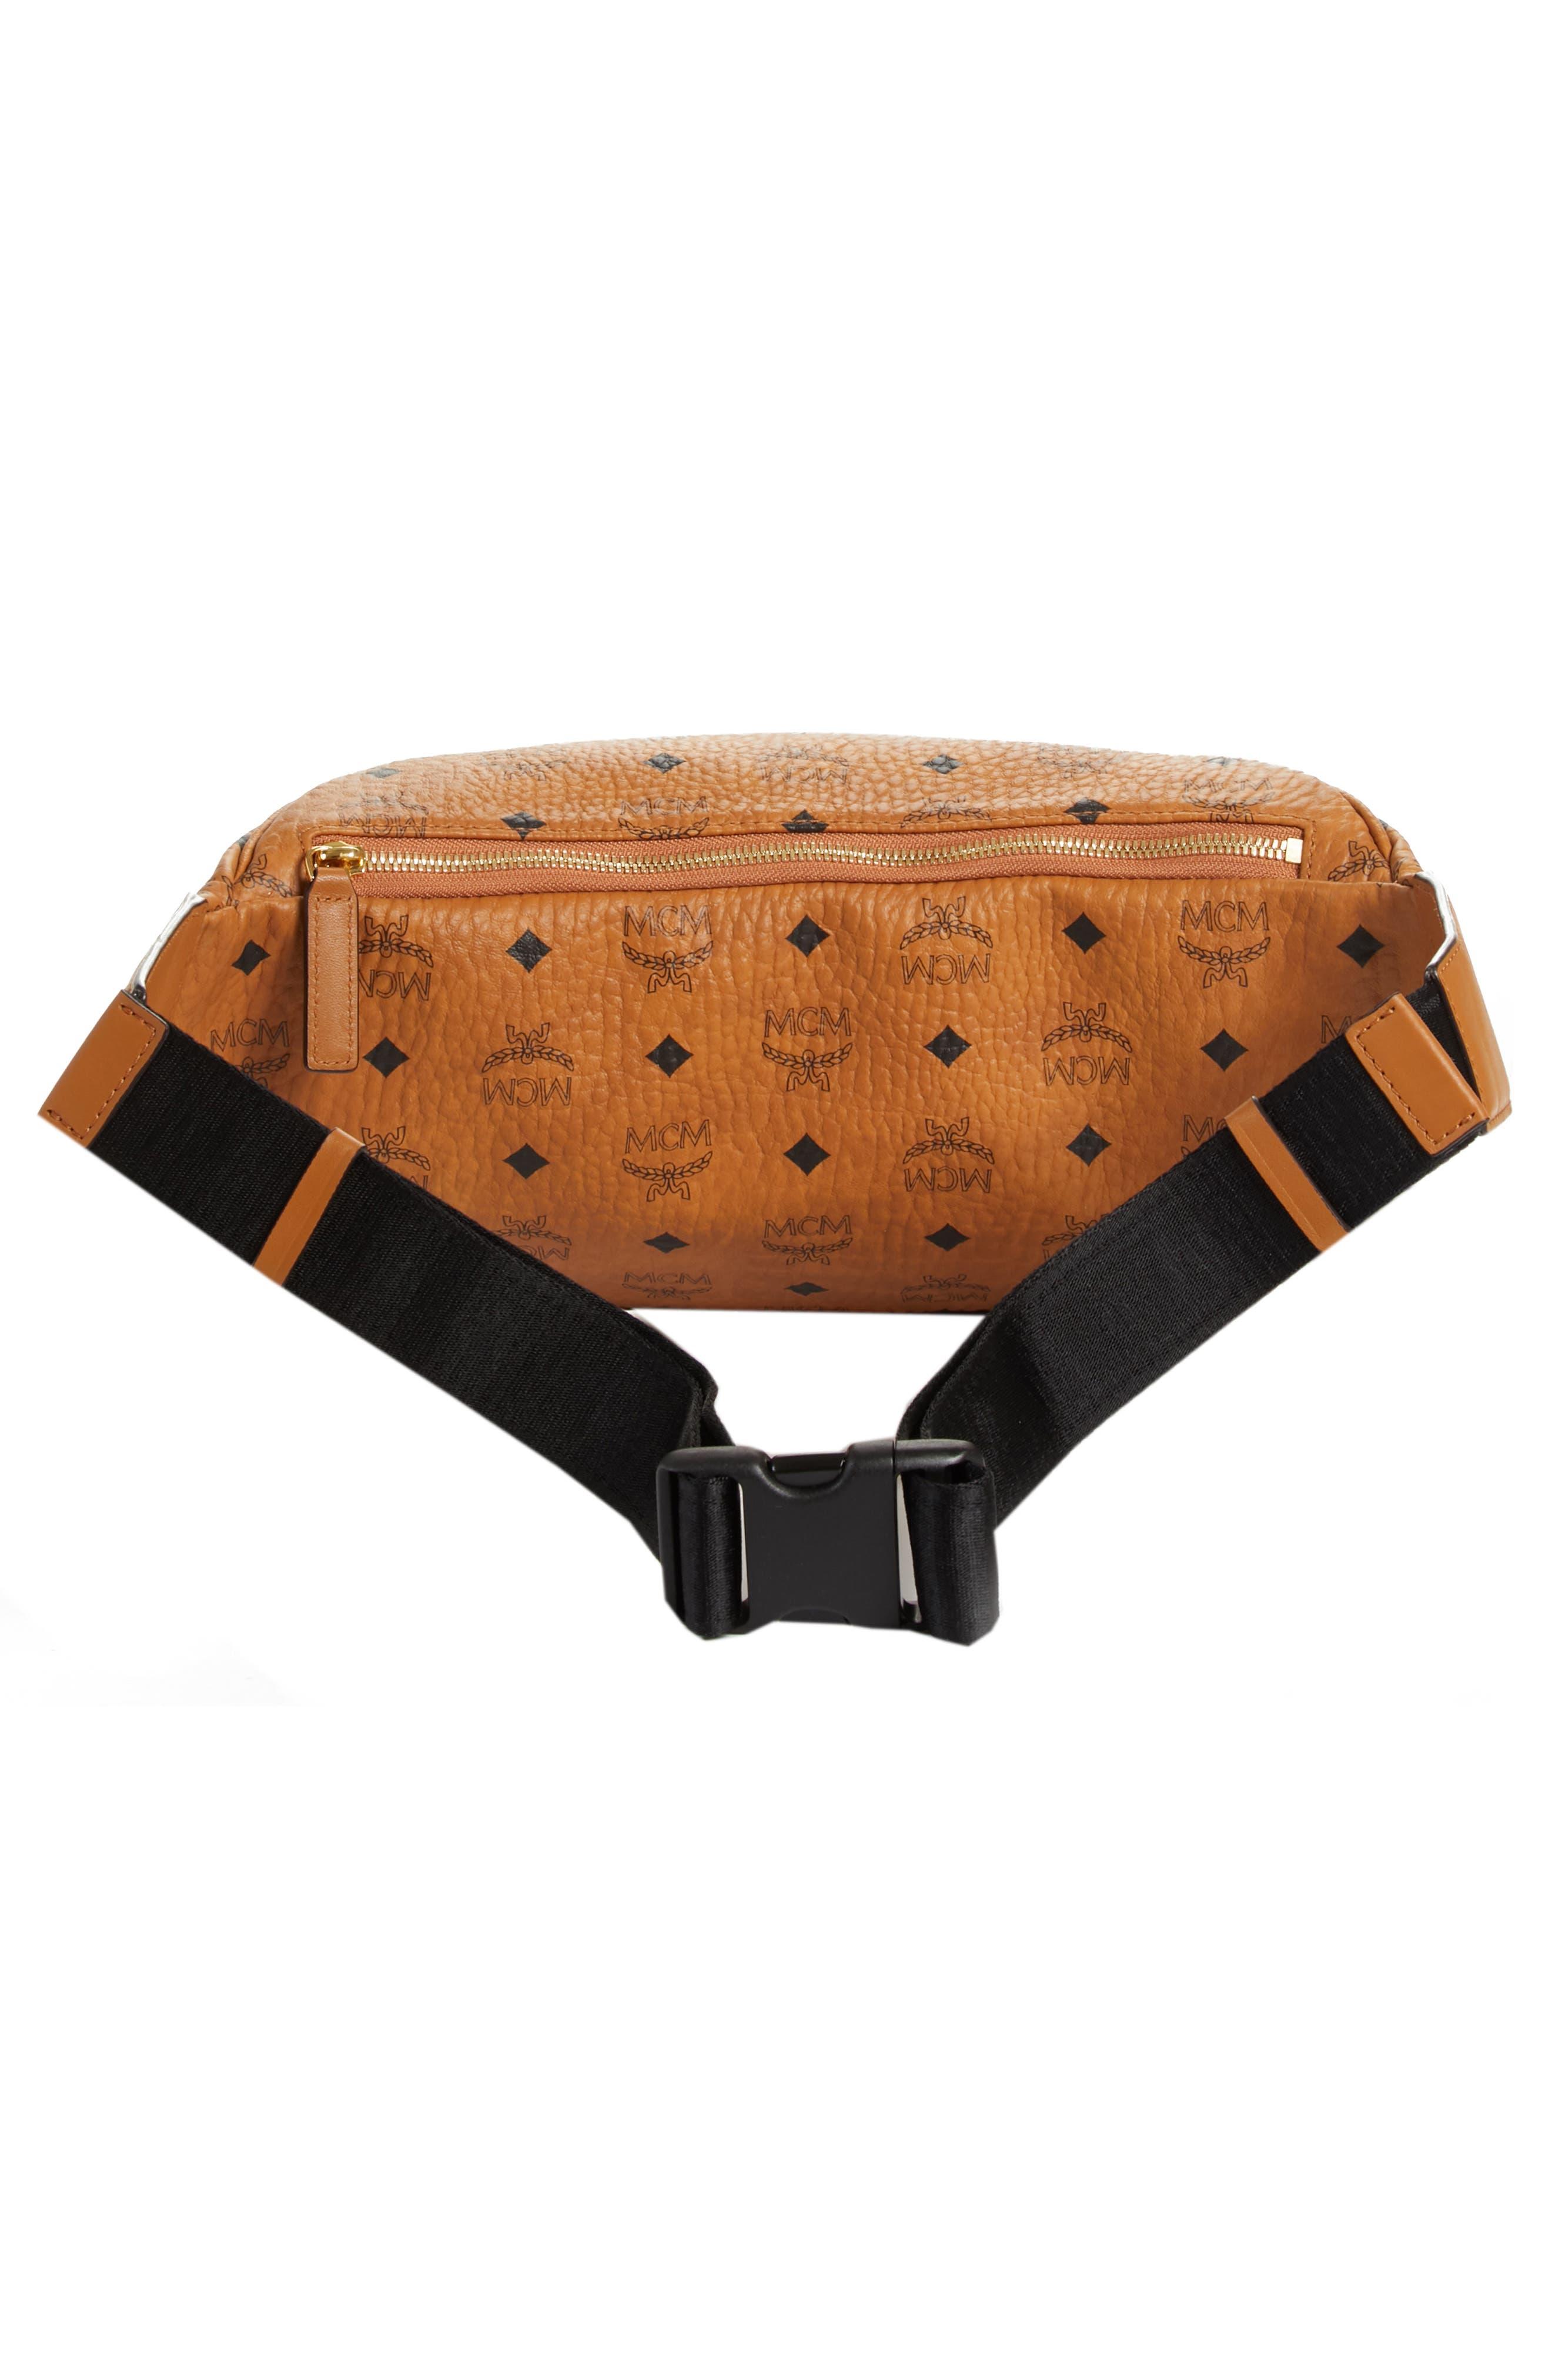 40ae9b35a3a94 MCM Belt Bags & Fanny Packs | Nordstrom